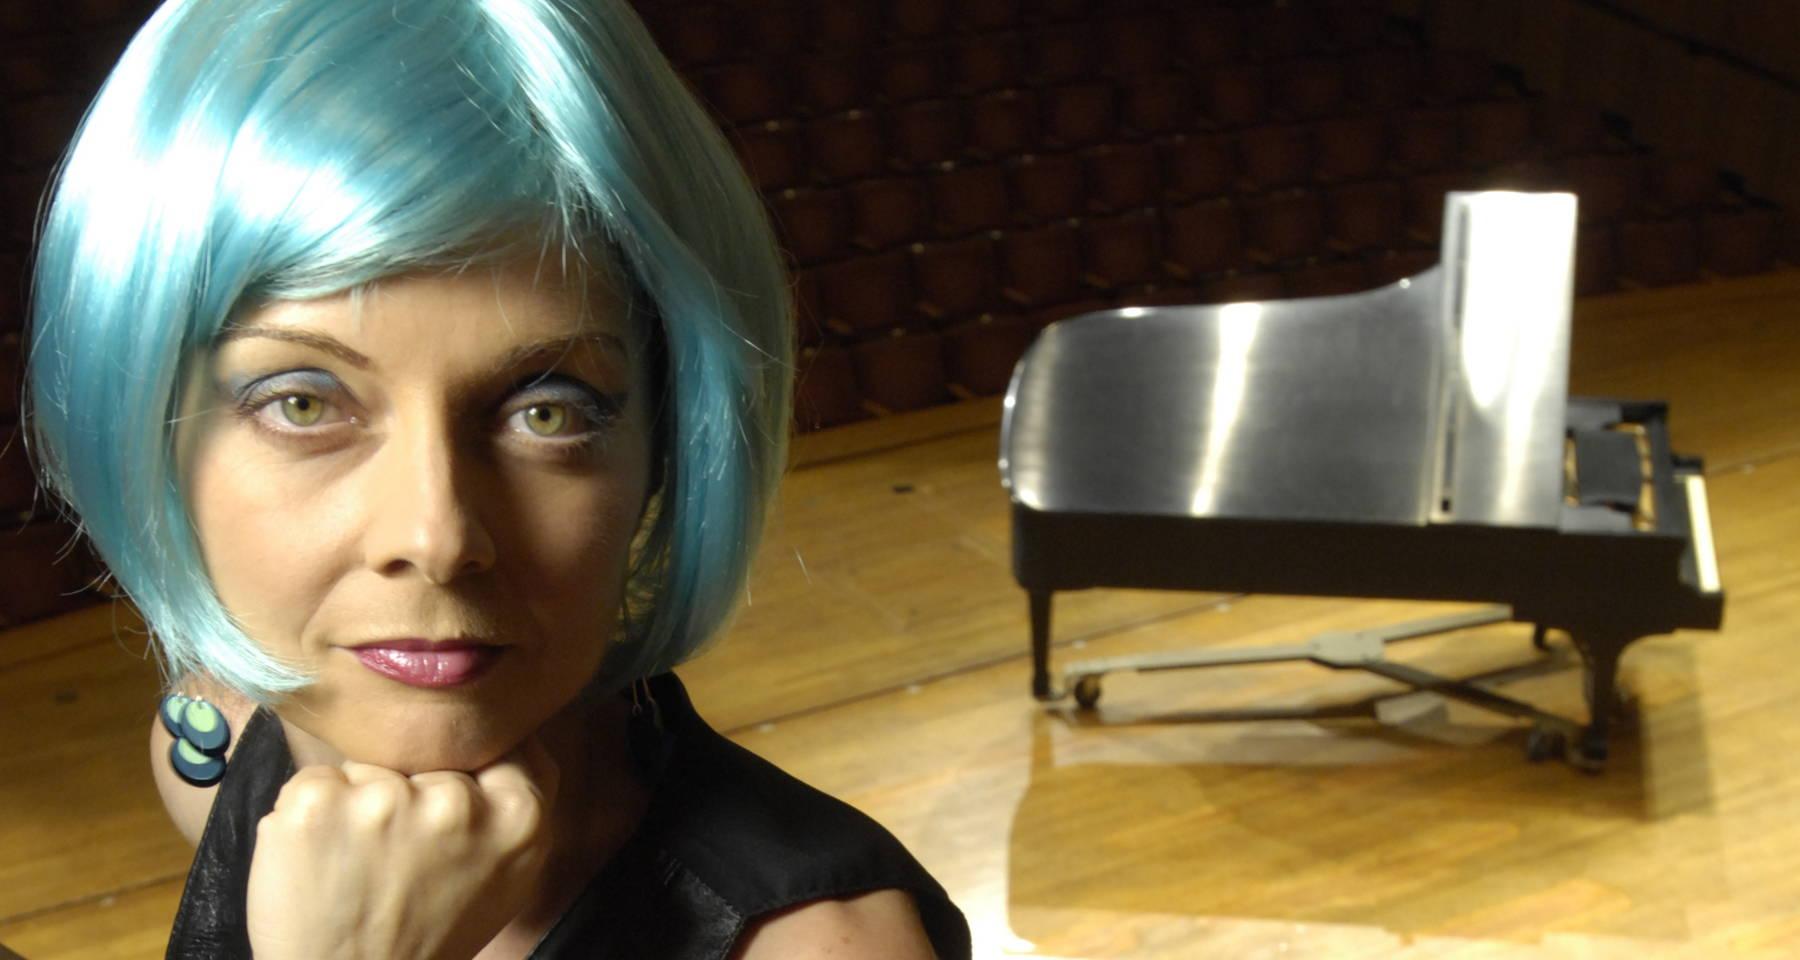 Pianist Nada world premiere of a piano work by Naji Hakim/ the Scherzo with Chopin and Brahms